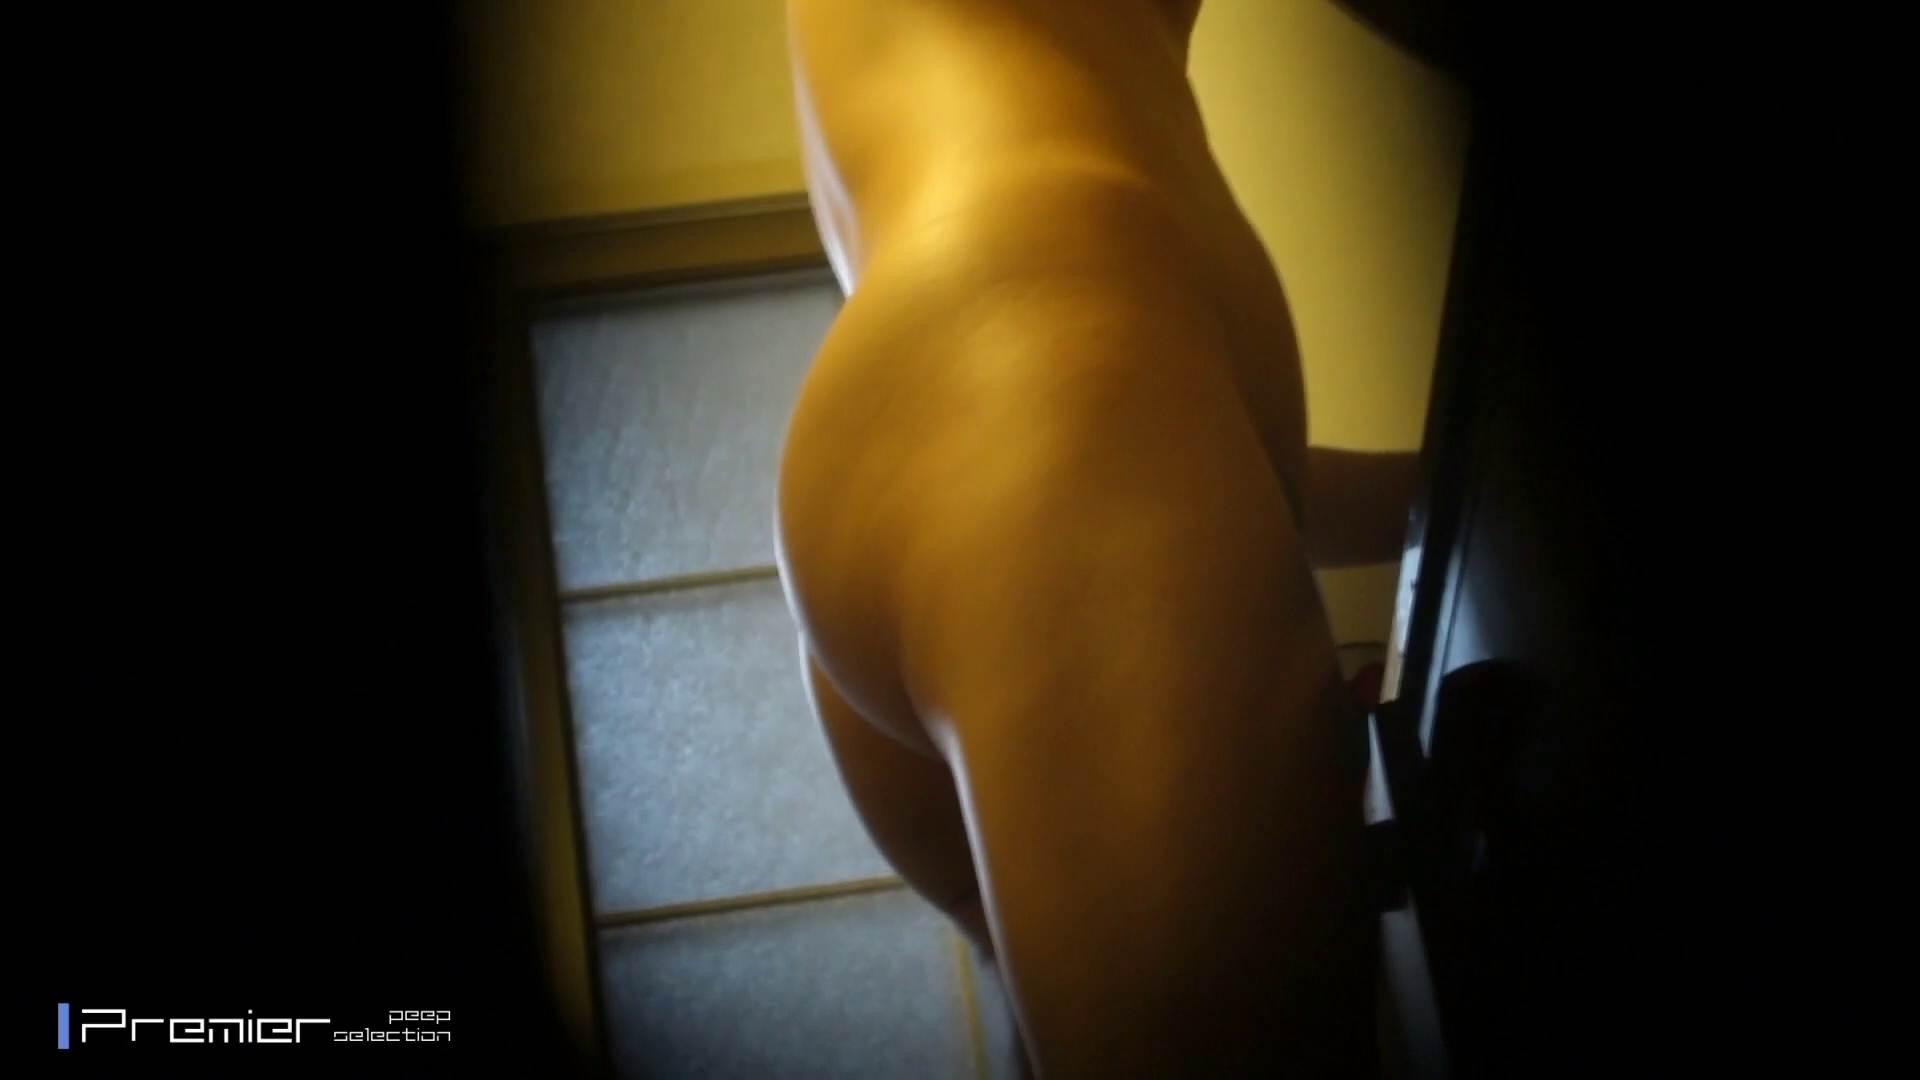 美人限定★女子大生の私生活★詰合せ 美女達の私生活に潜入! 高画質 SEX無修正画像 63画像 21